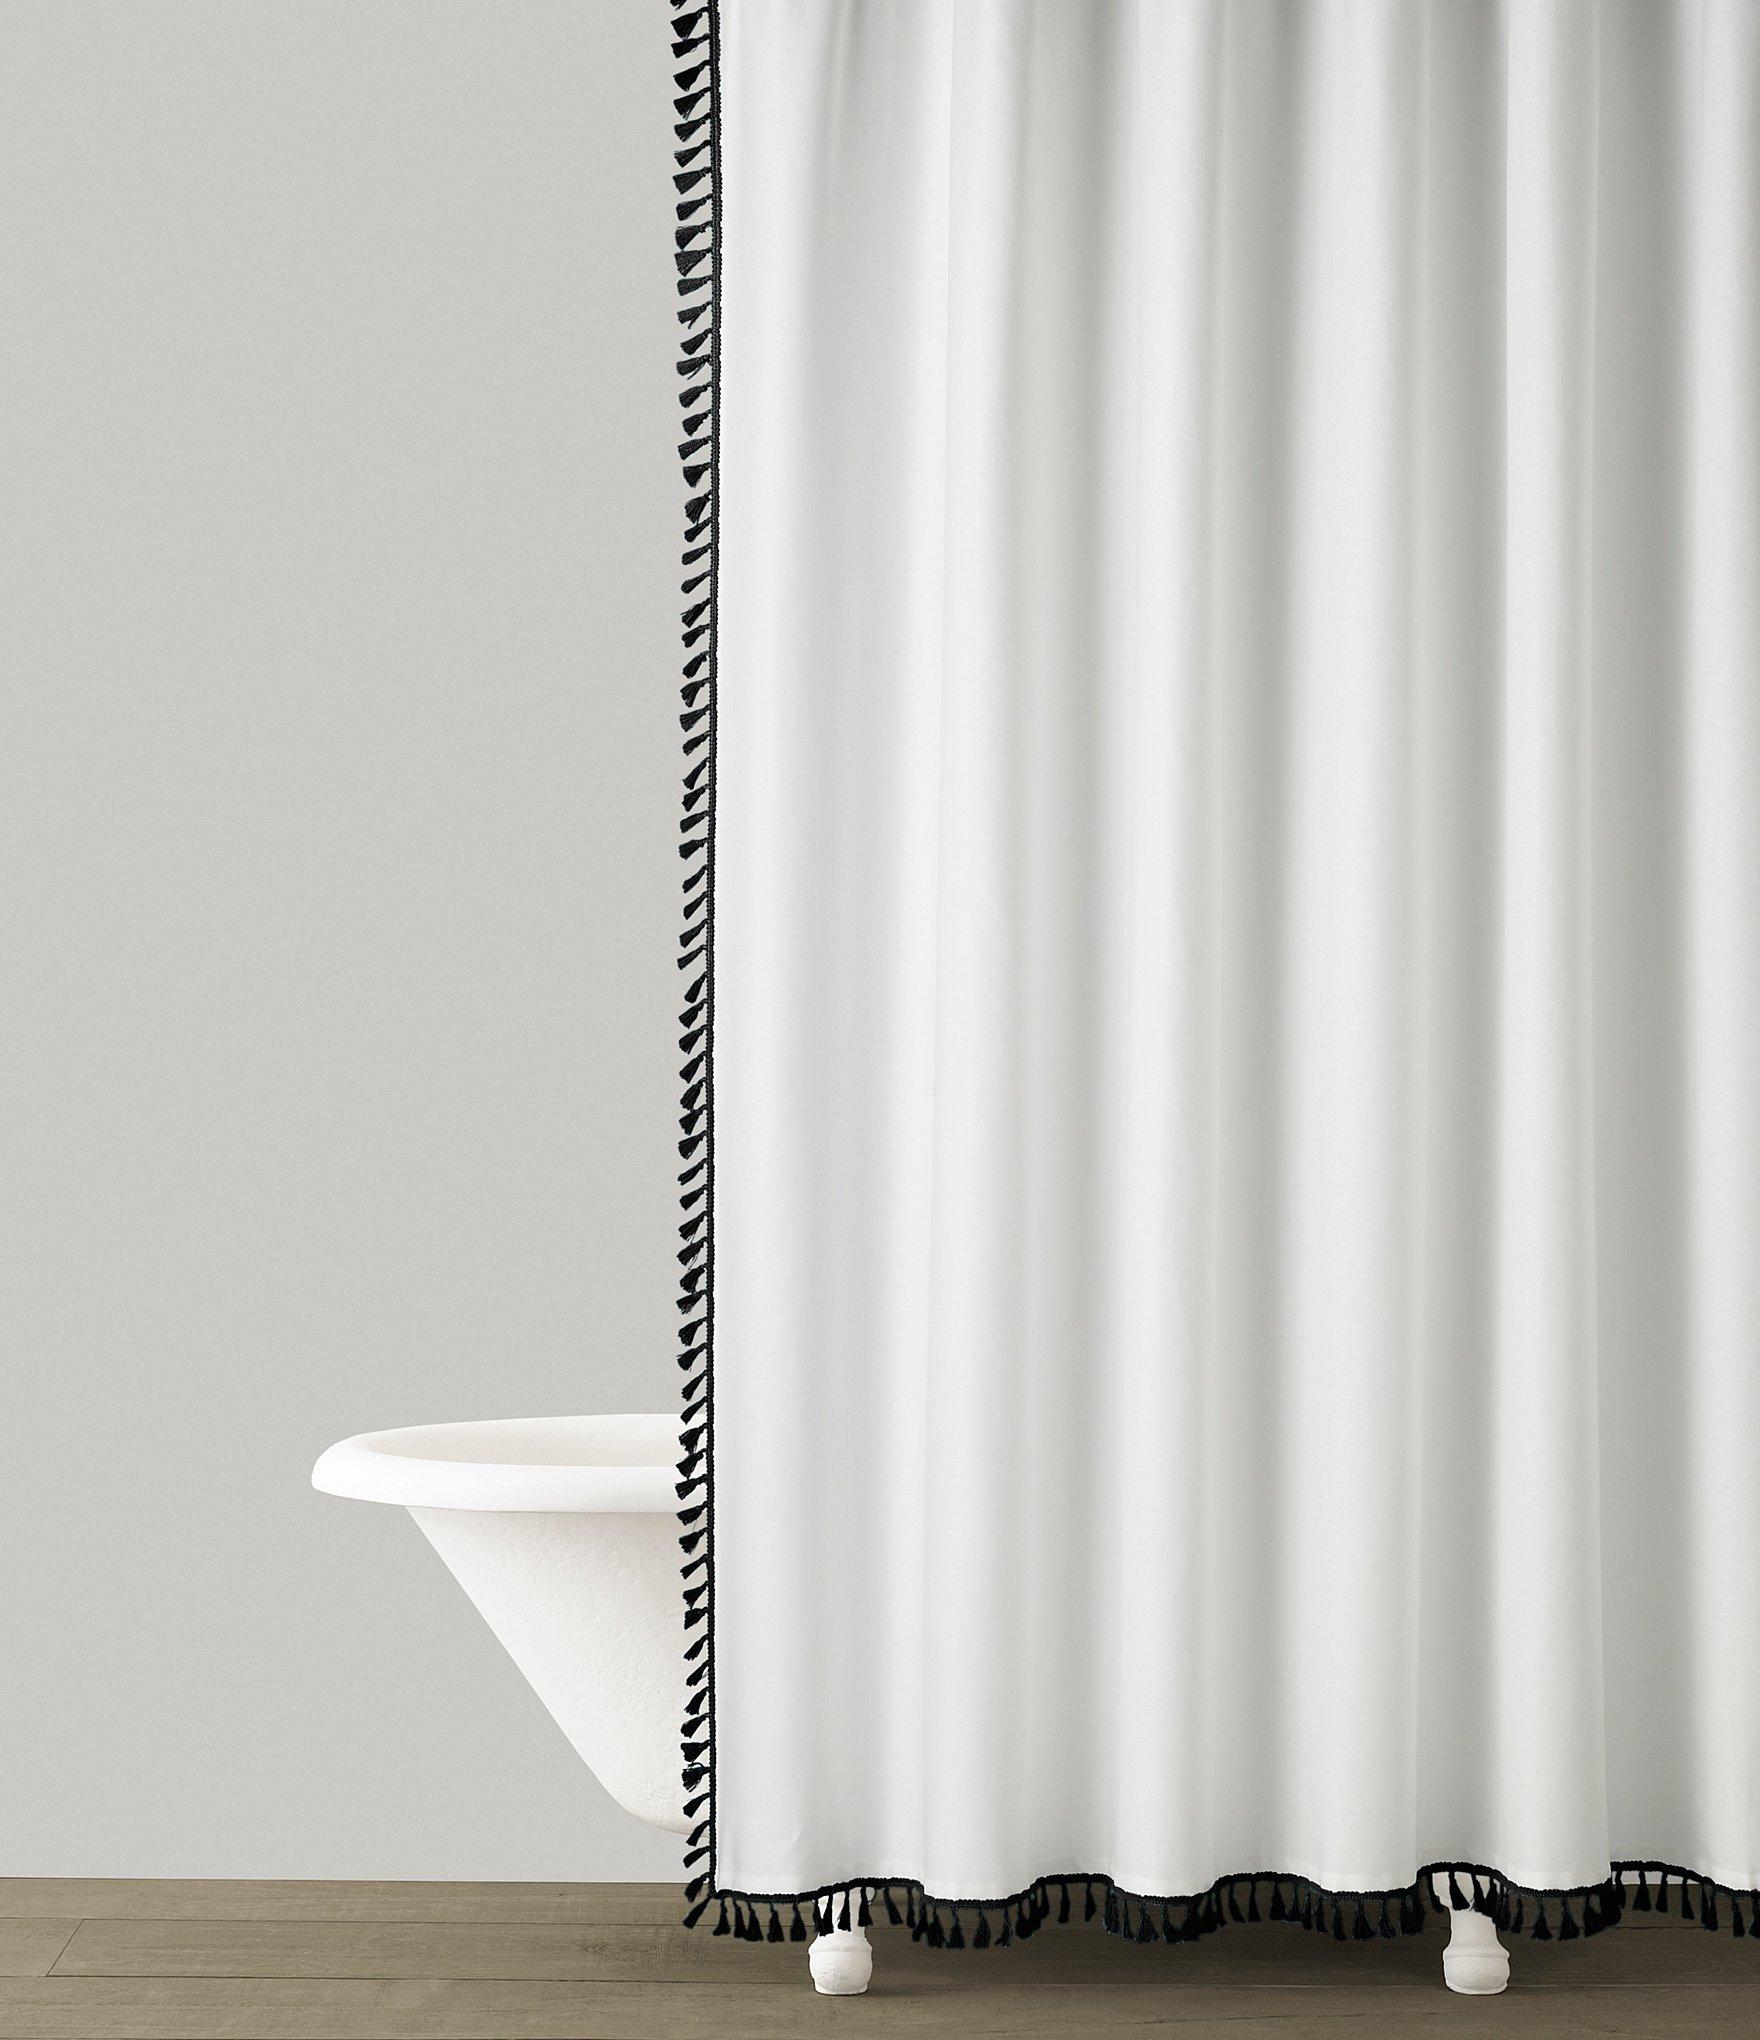 dillard\'s: Bath Towels, Shower Curtains & Bath Accessories ...